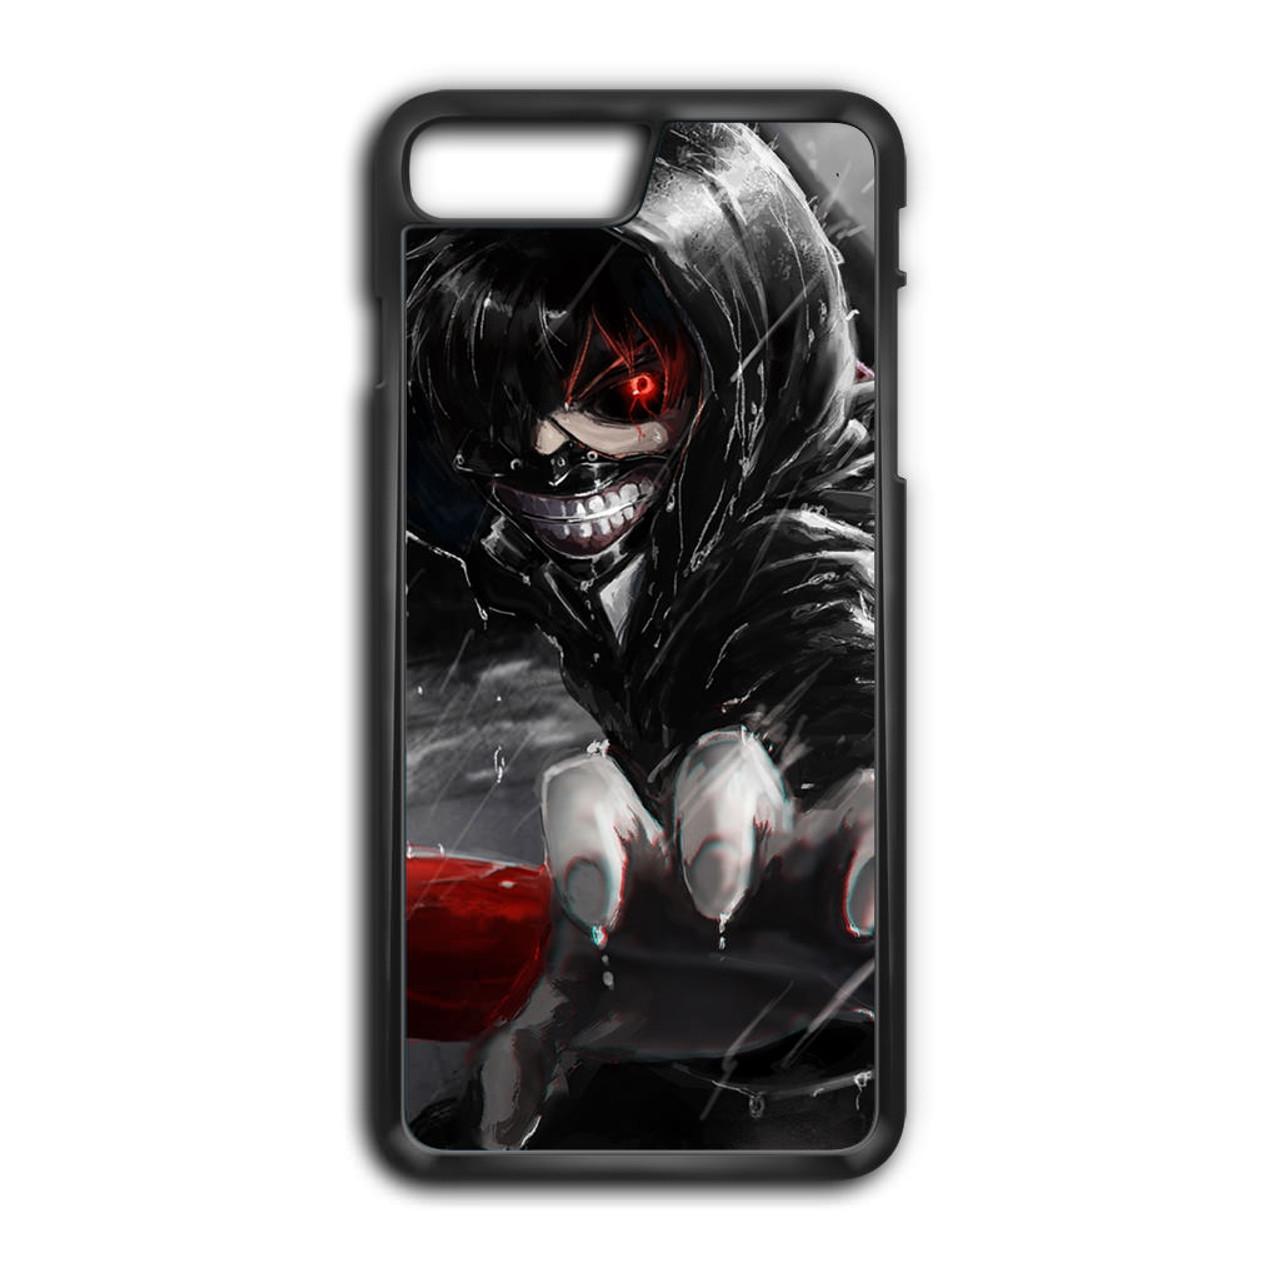 the latest 66bb8 fefe9 Anime Tokyo Ghoul Ken Kaneki 2 iPhone 7 Plus Case